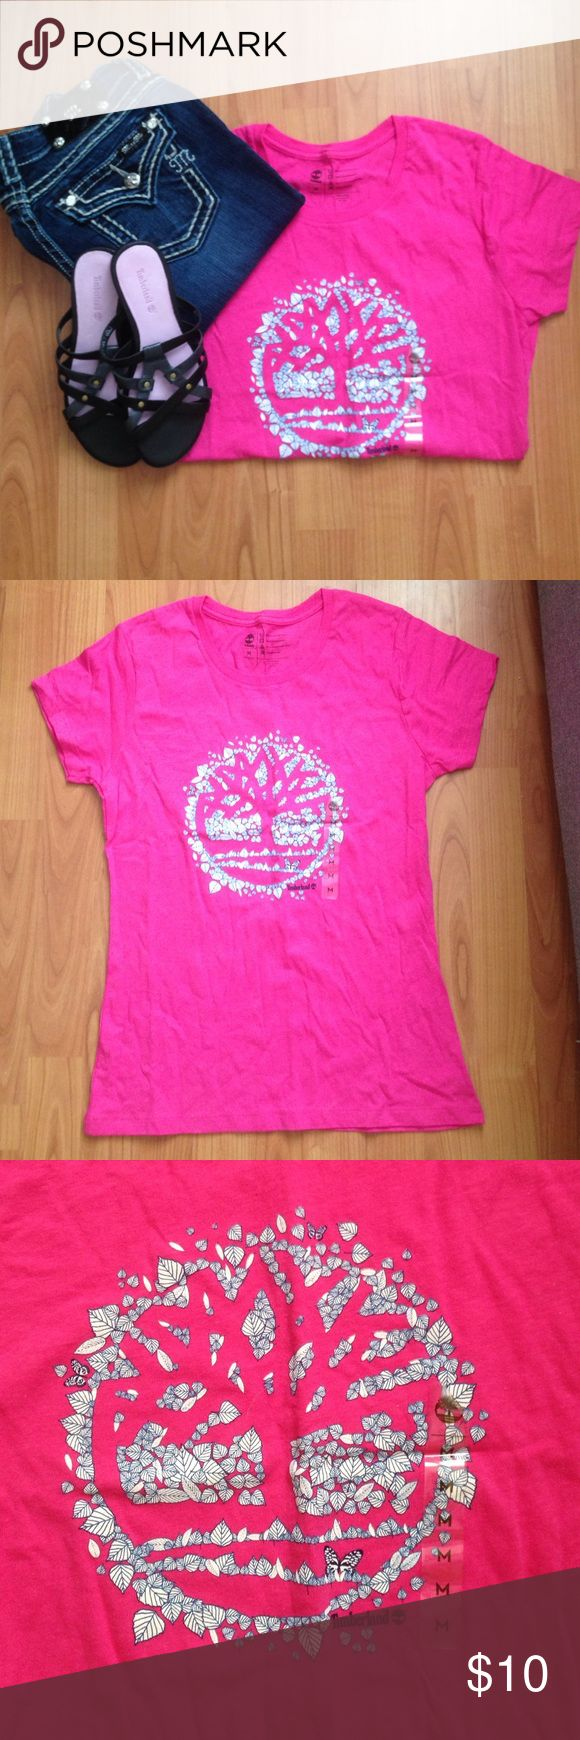 Timberland T-Shirt Women's pink timberland logo T.. Never worn Timberland Tops Tees - Short Sleeve